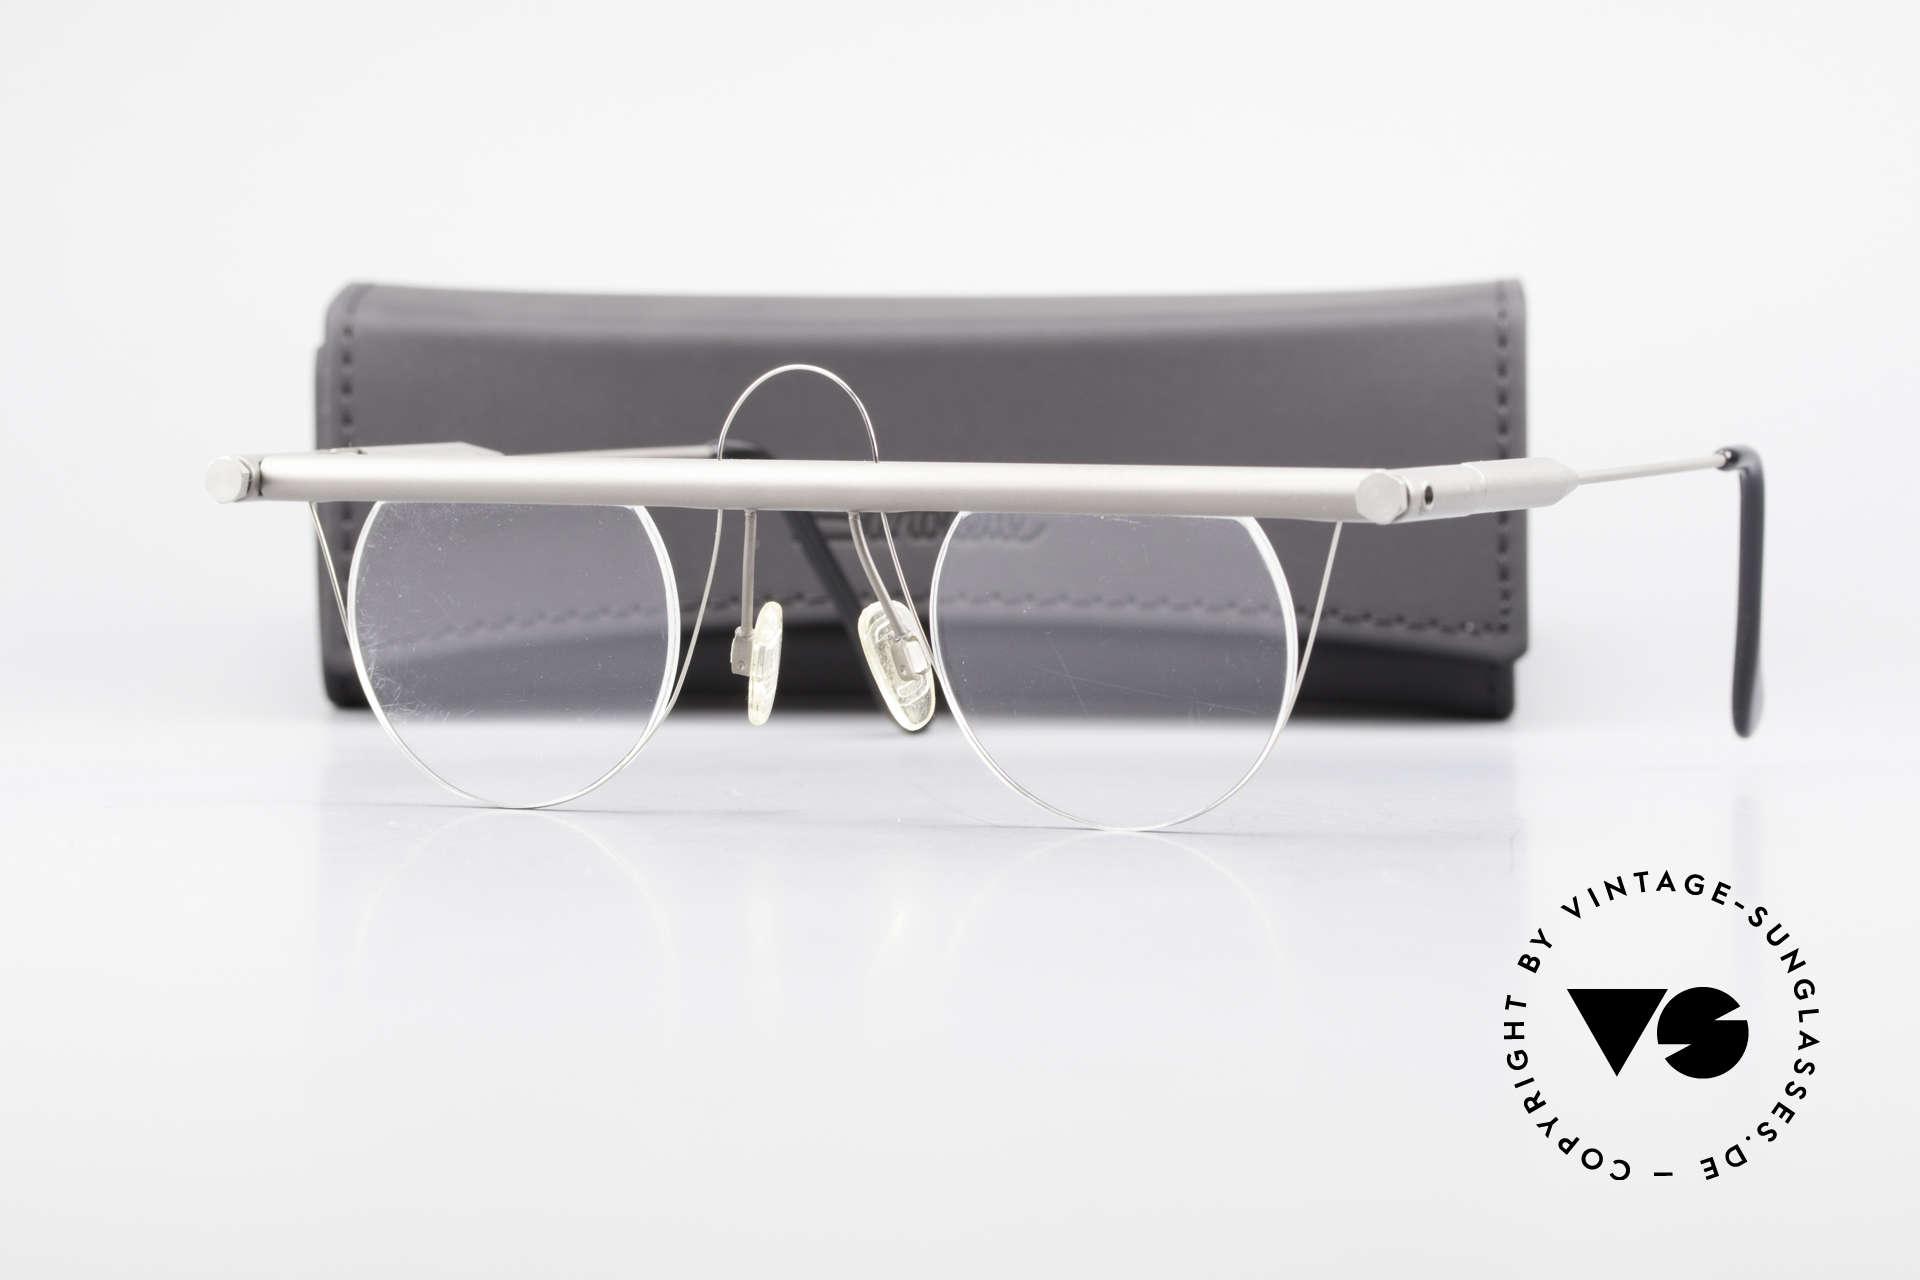 Bauhaus Rohrbrille Bauhaus Glasses Marcel Breuer, Size: medium, Made for Men and Women